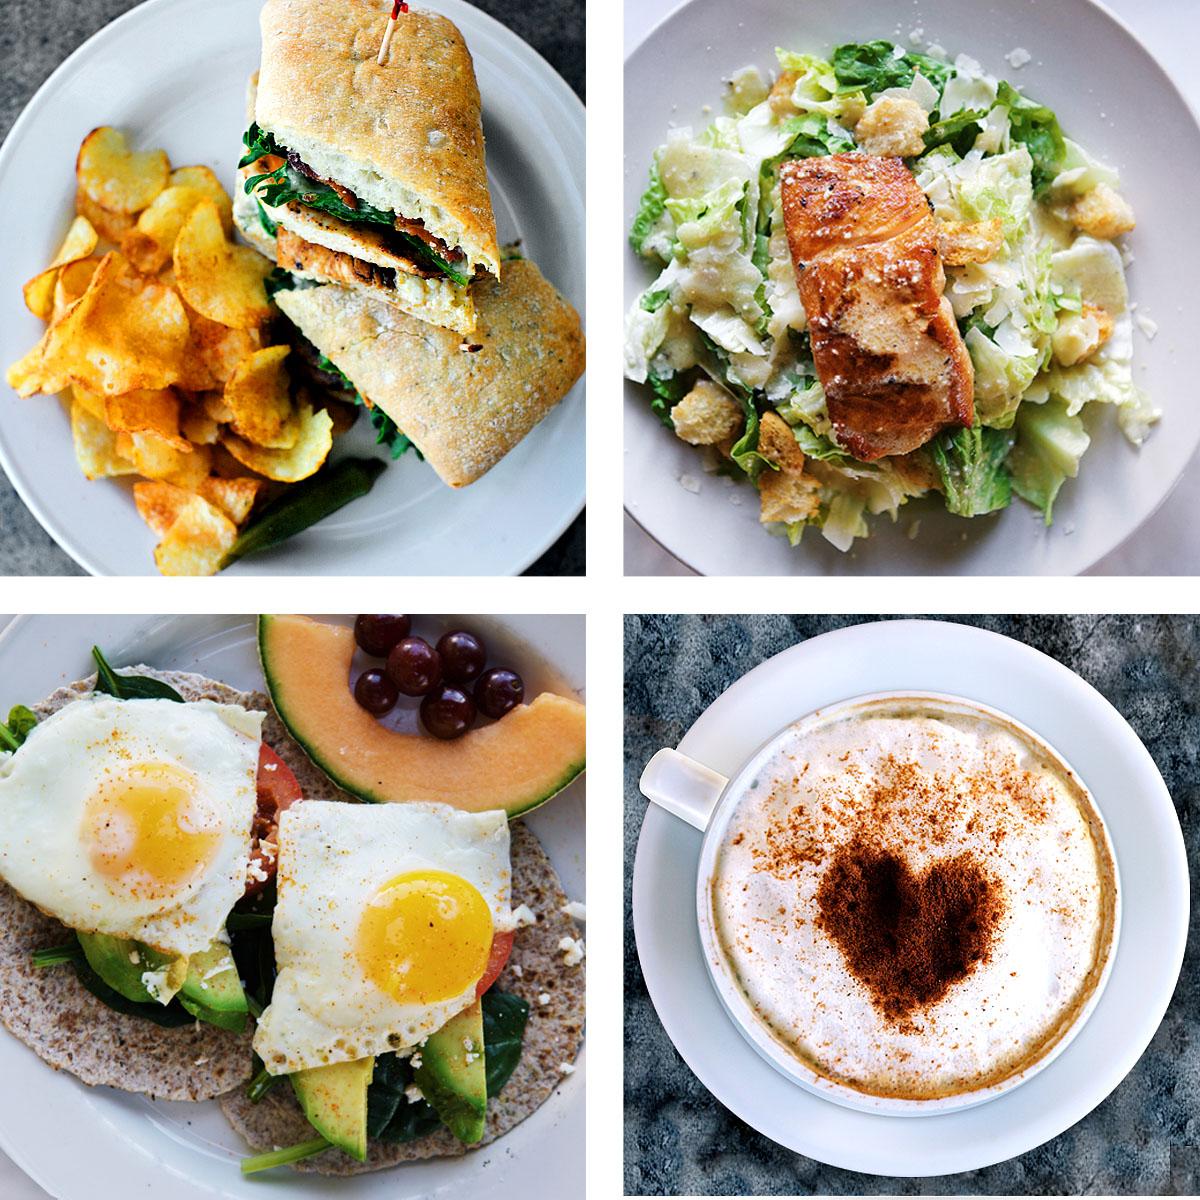 Best Restaurants In Covington La